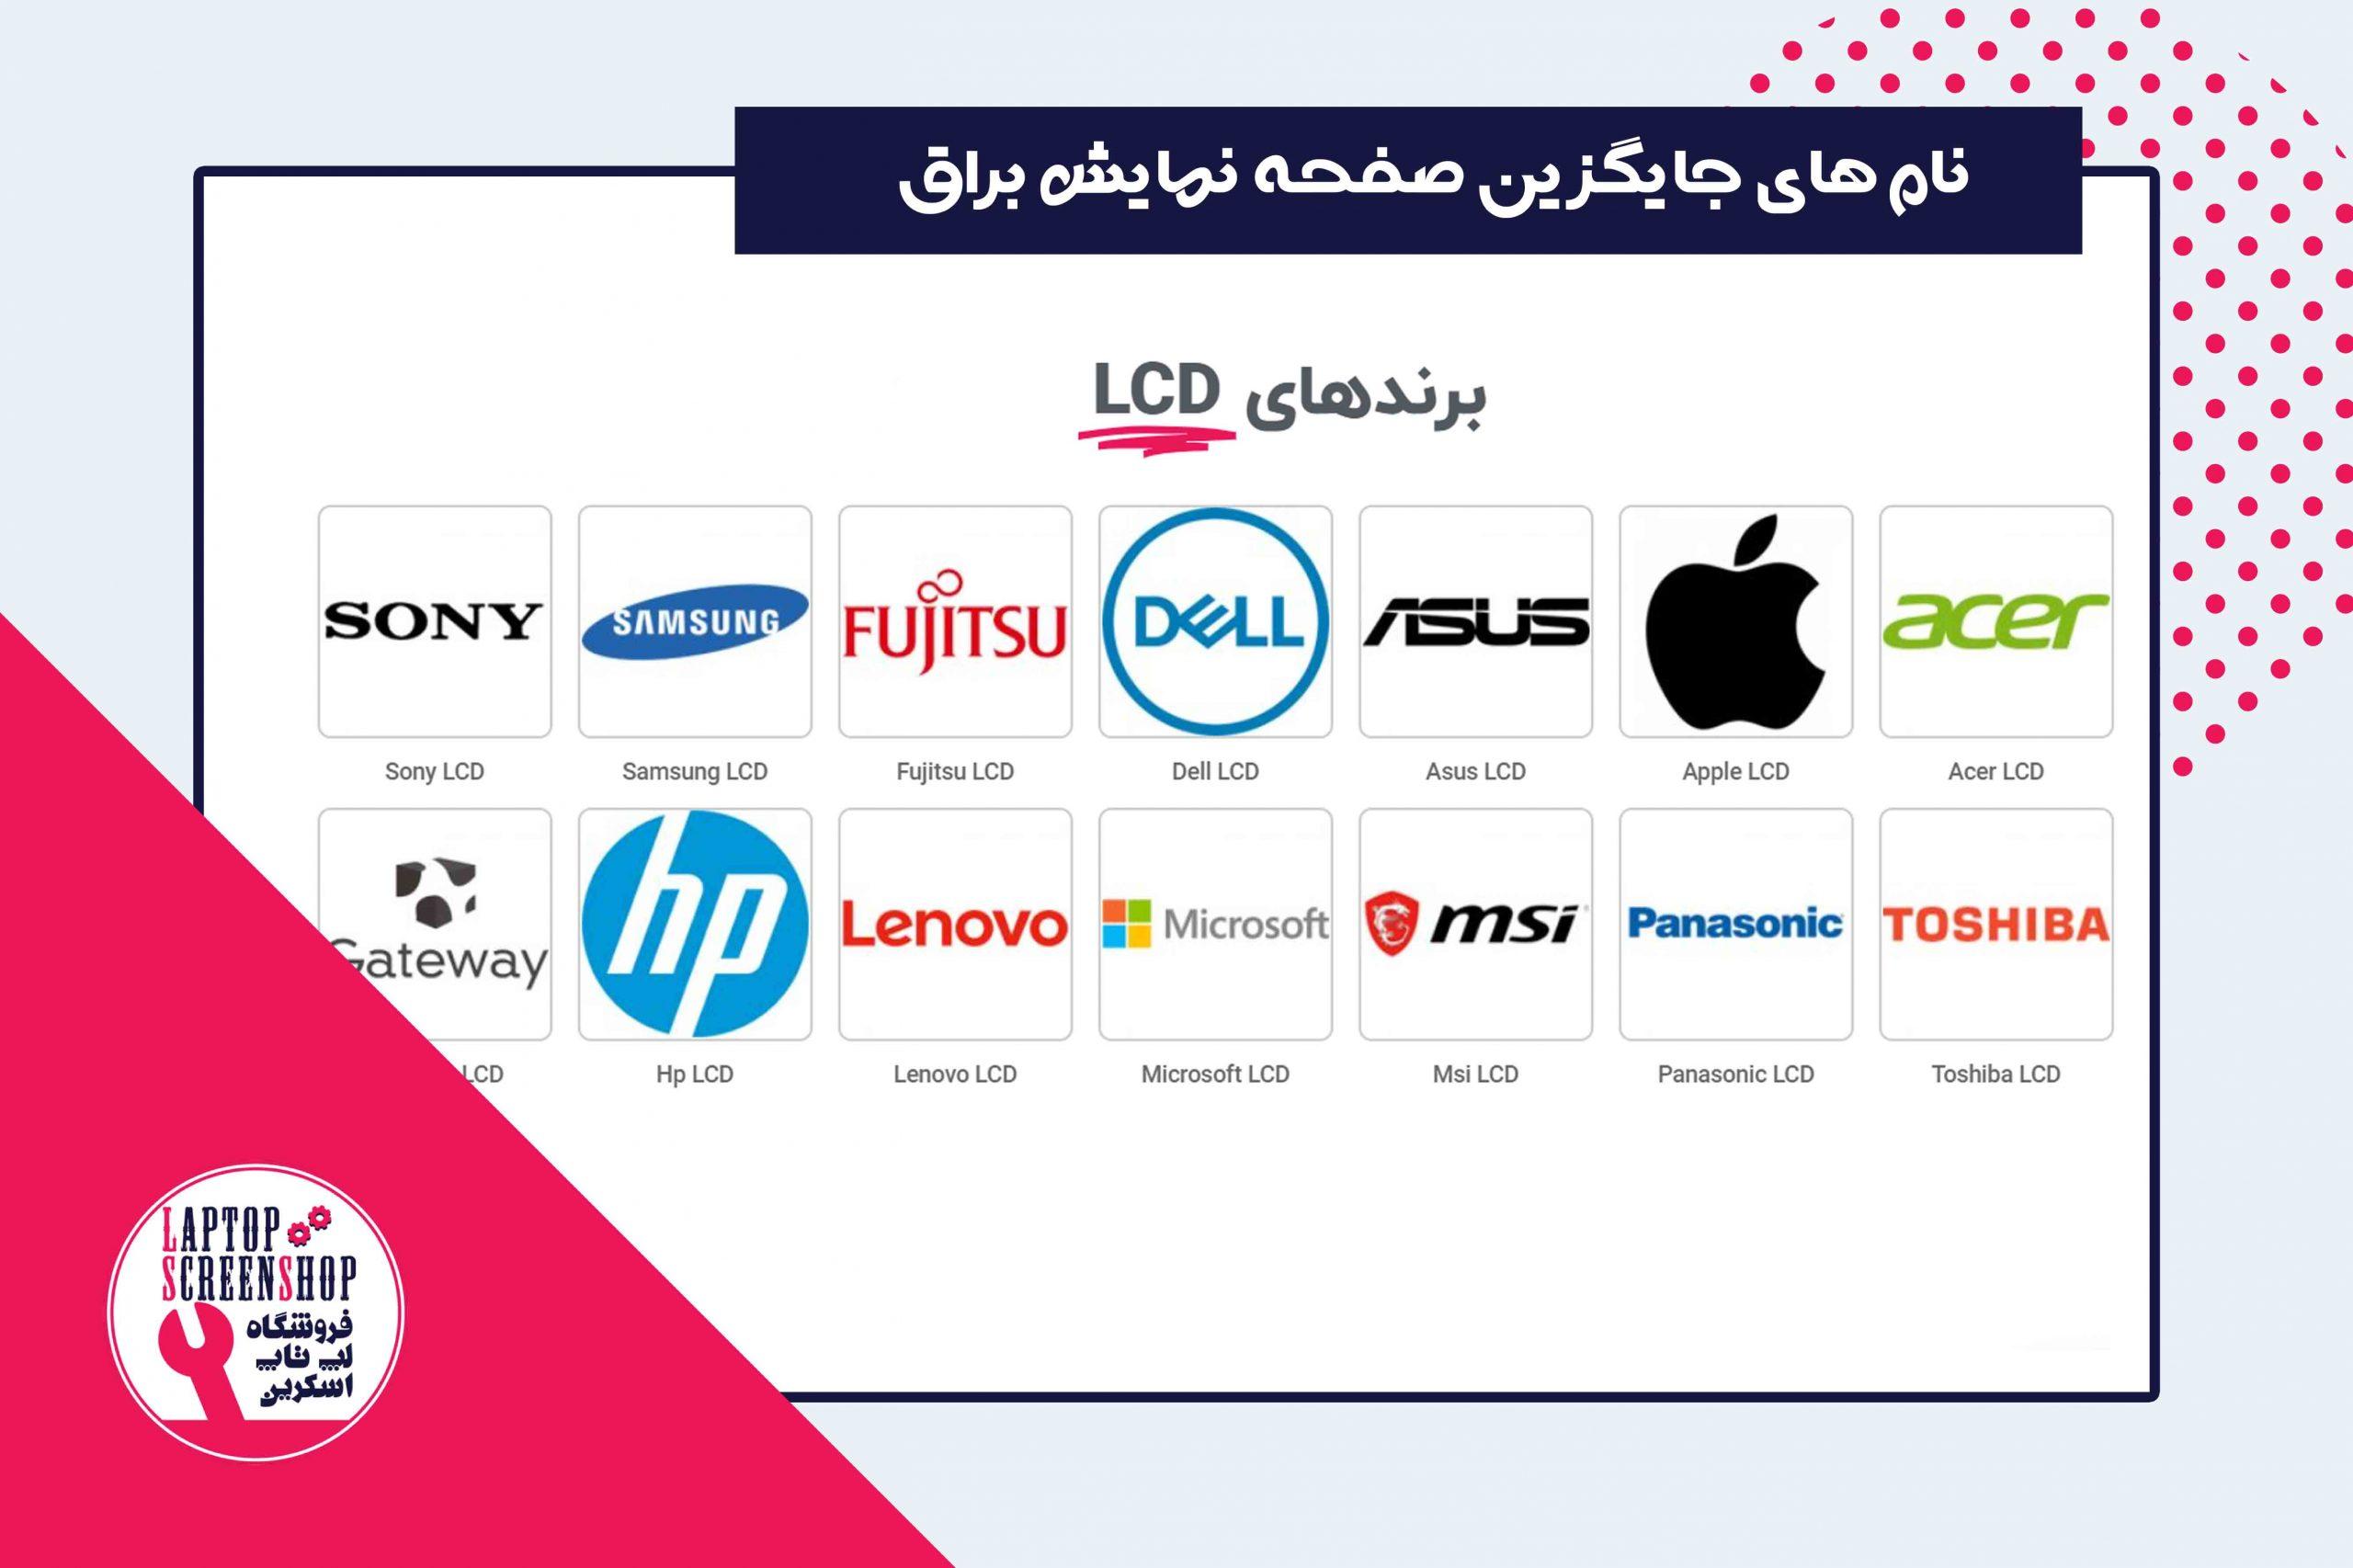 alternative-glossy-screen-names-by-manufacturer تعمیرات گوشی  تعمیر لپ تاپ